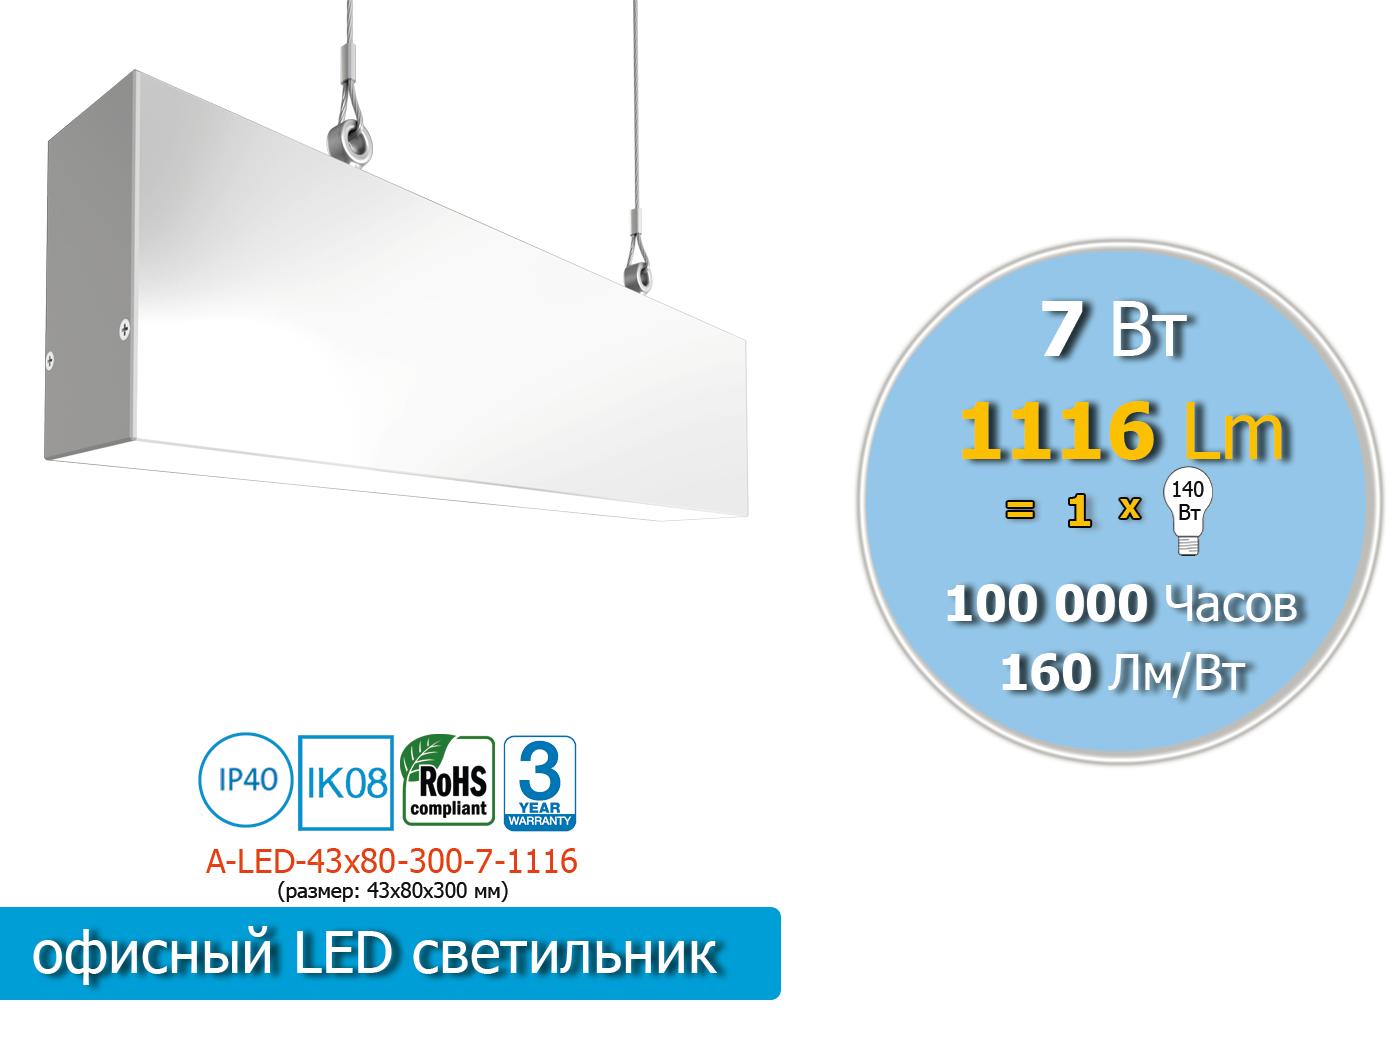 A-LED-43х80-300-7-1116